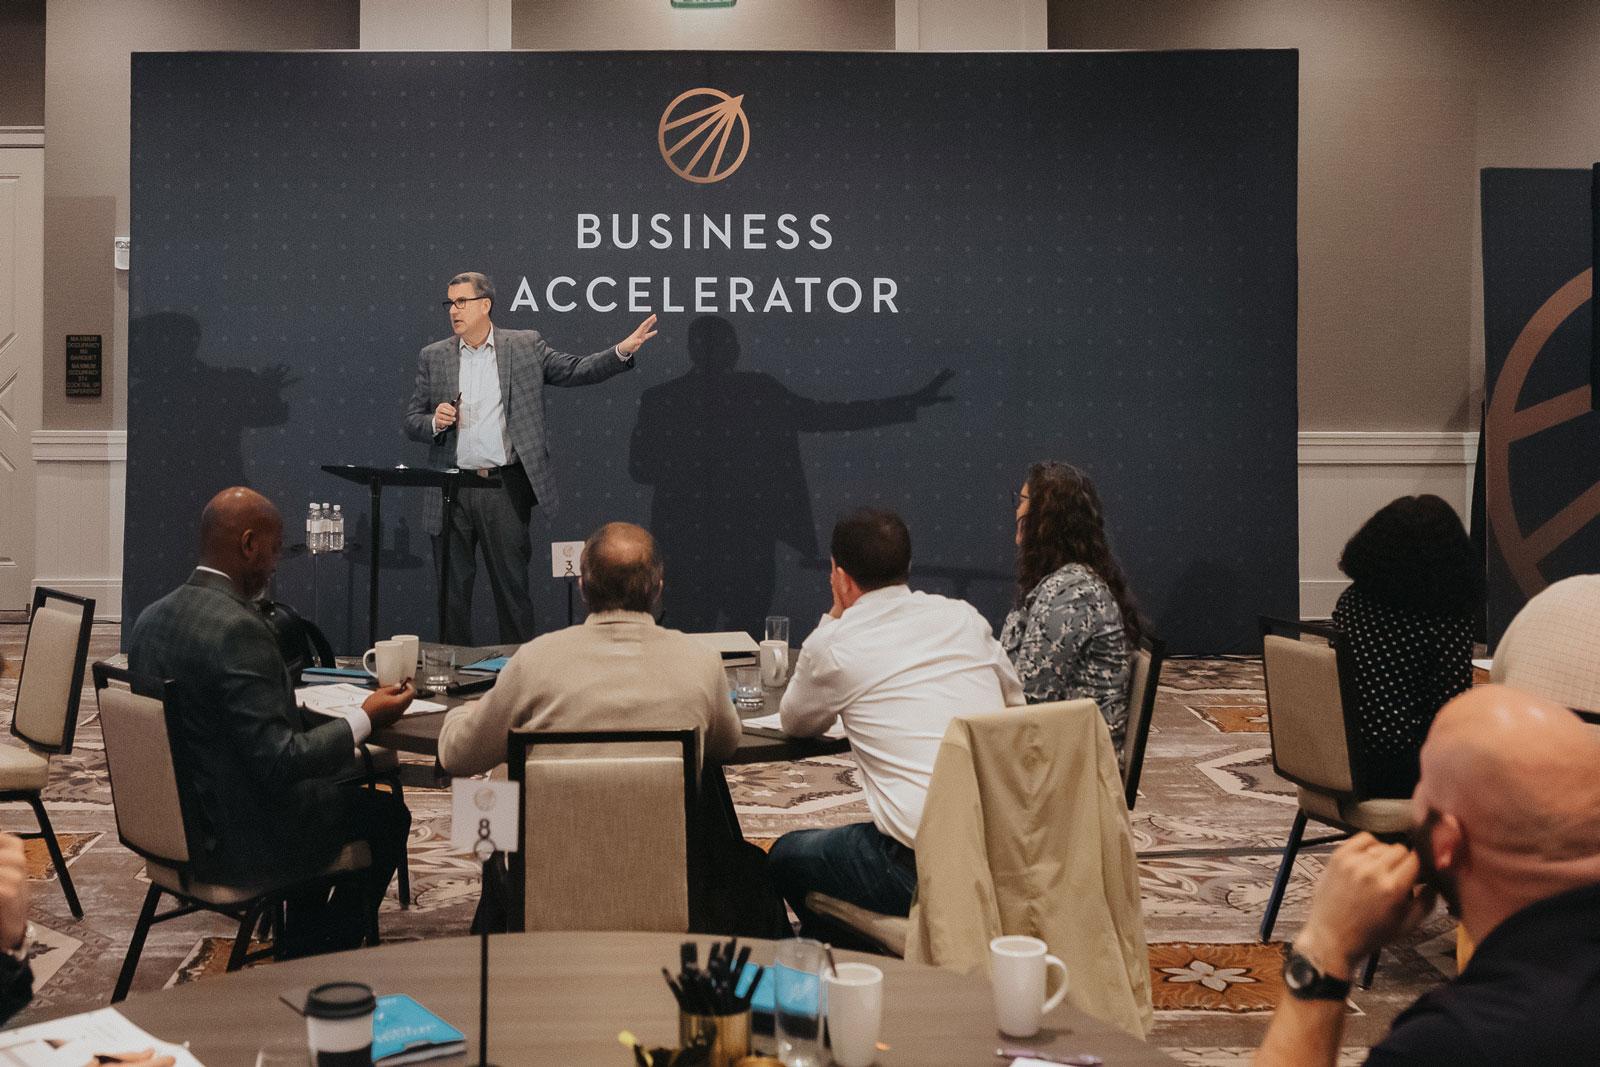 BusinessAccelerator: Michael Hyatt's Business Coaching Program